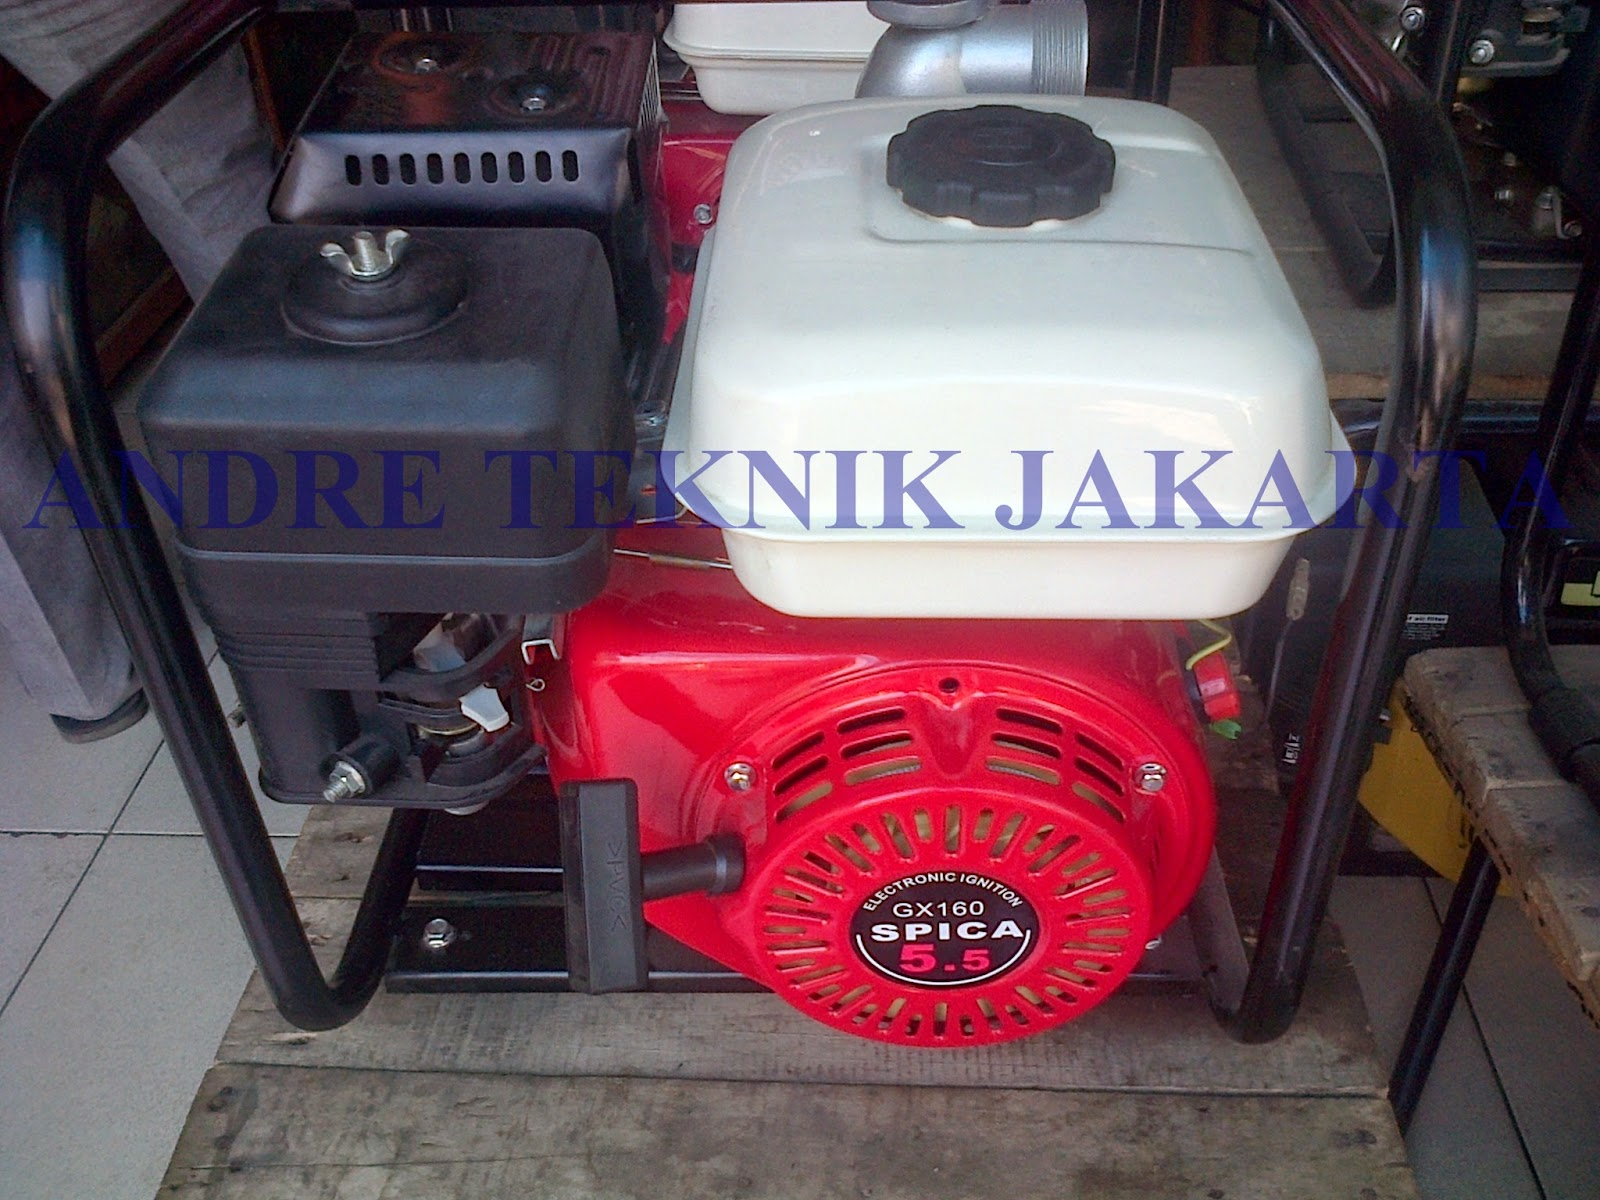 Andre Teknik Jakarta February 2014 Karburator Mesin Penggerak Gx160 Kw 55pk 160cc